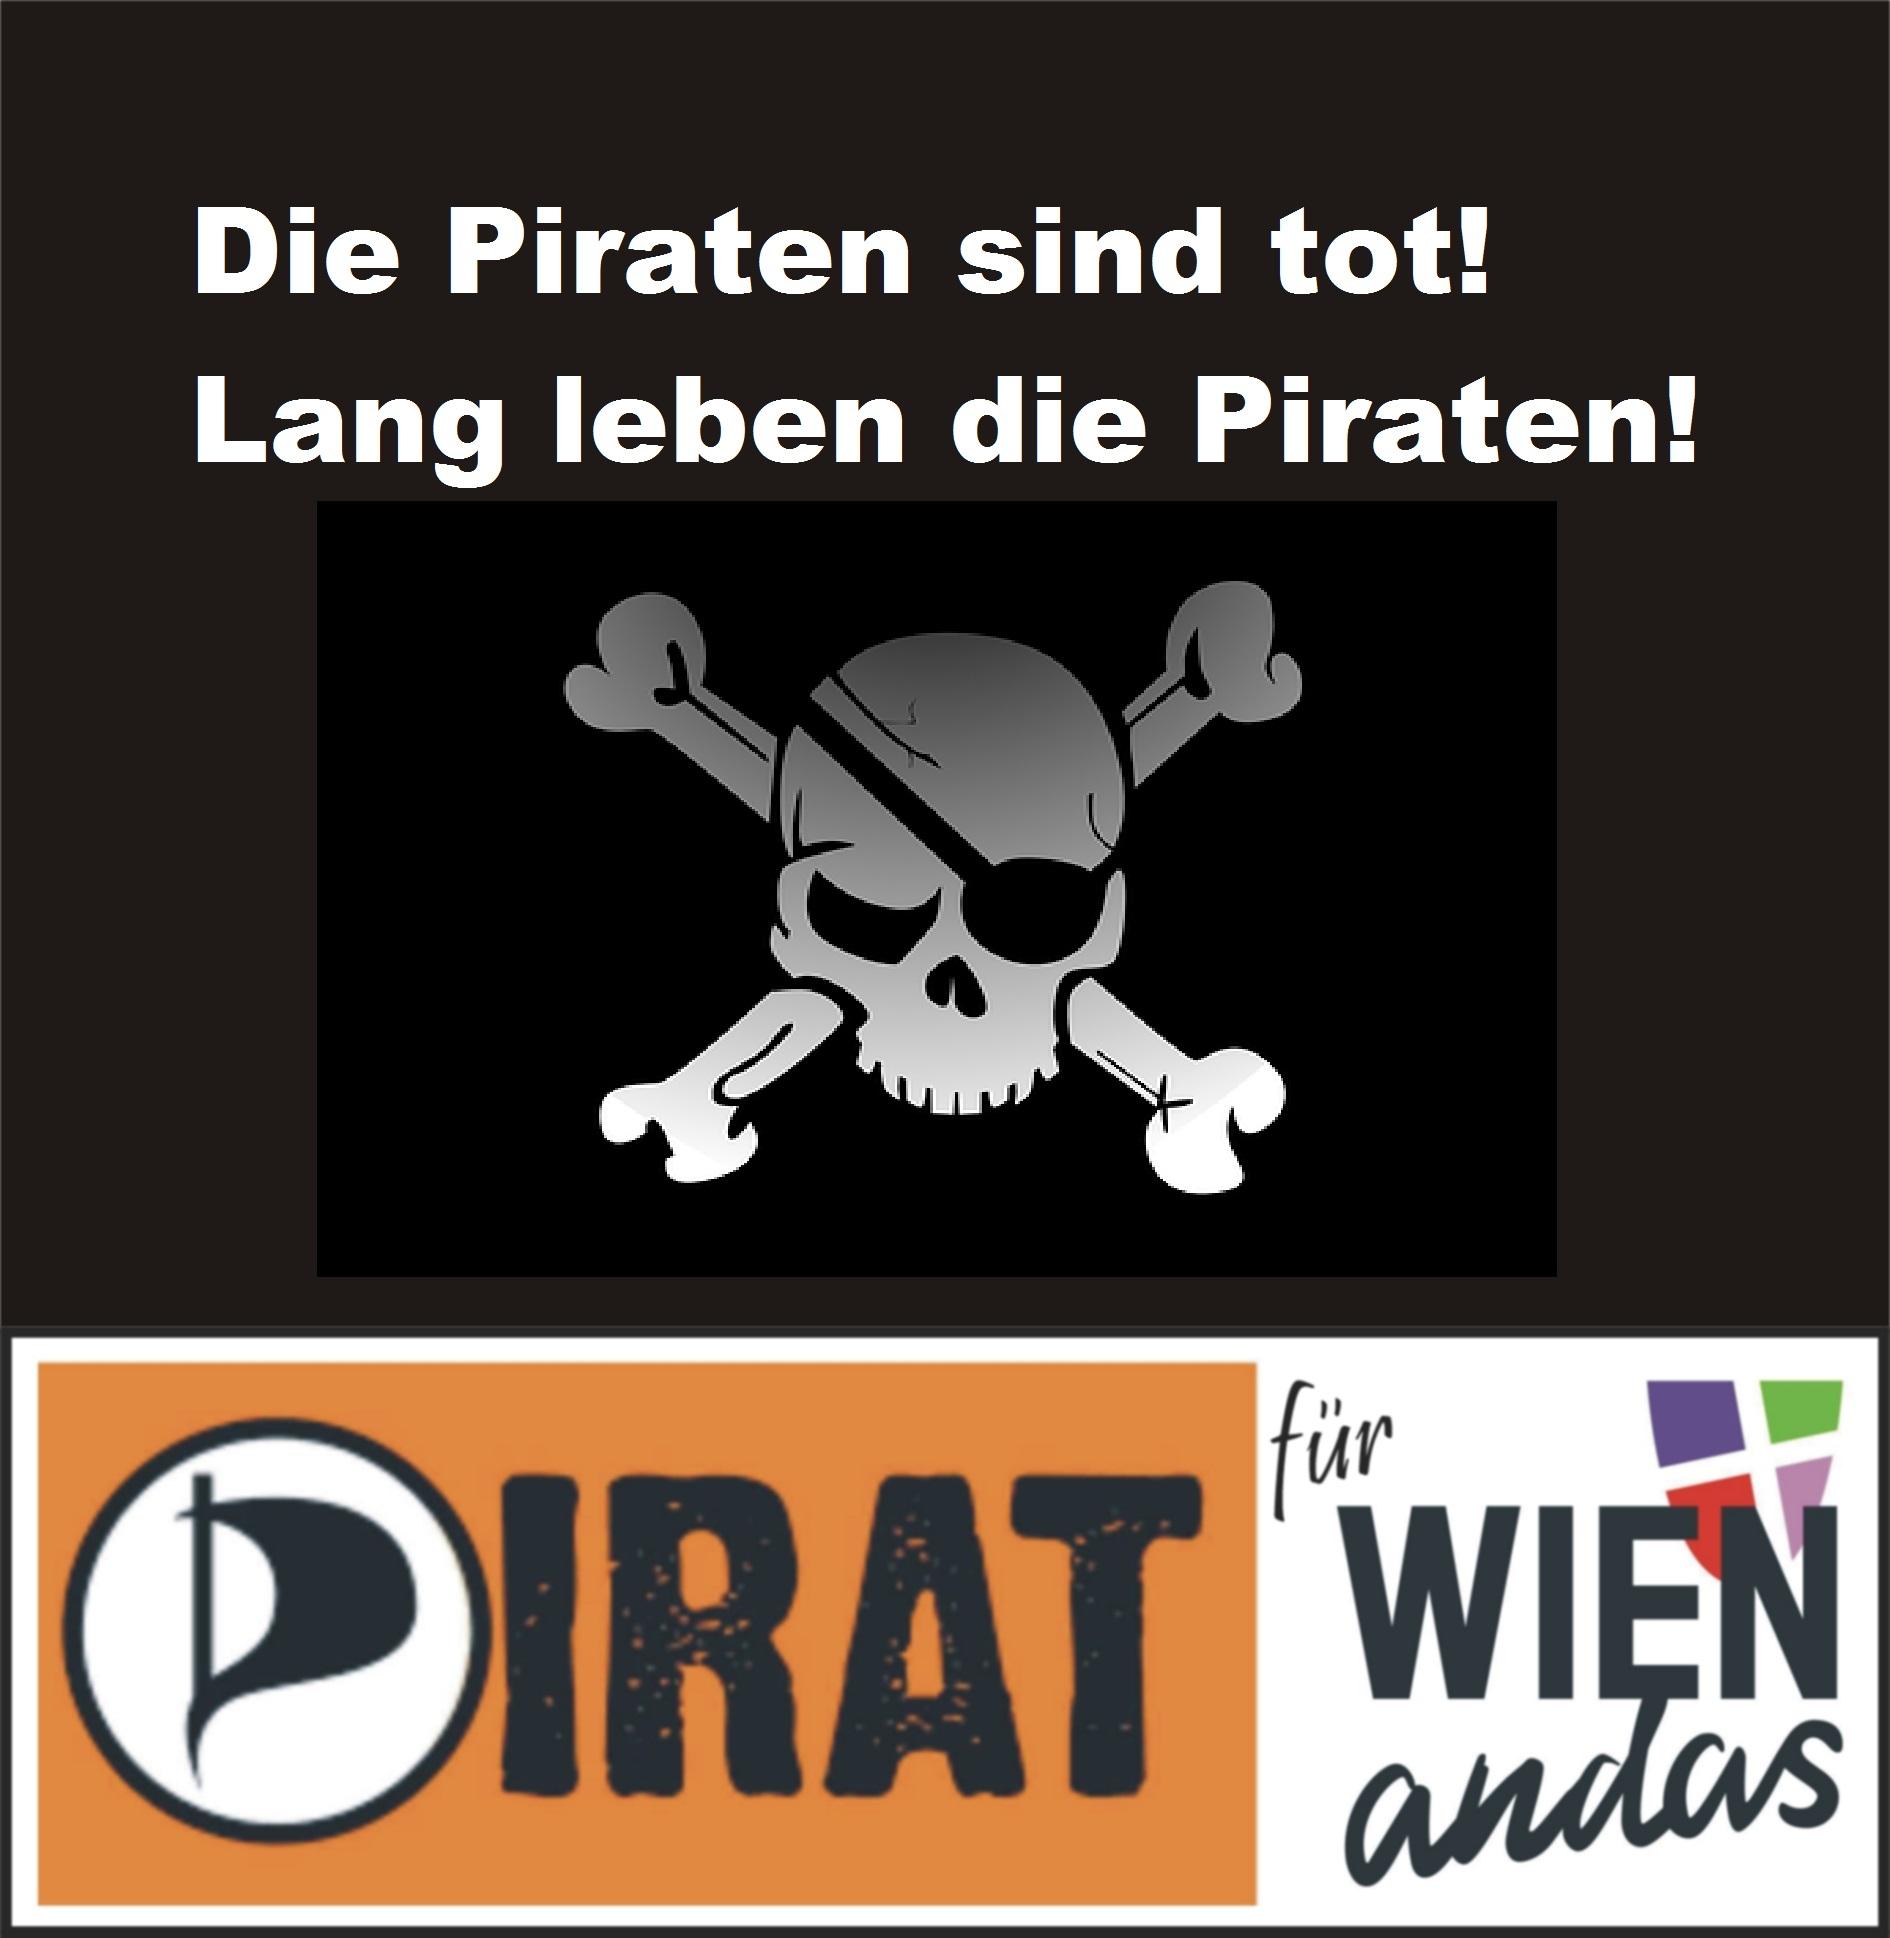 Die Piraten sind tot! Lang leben die Piraten!